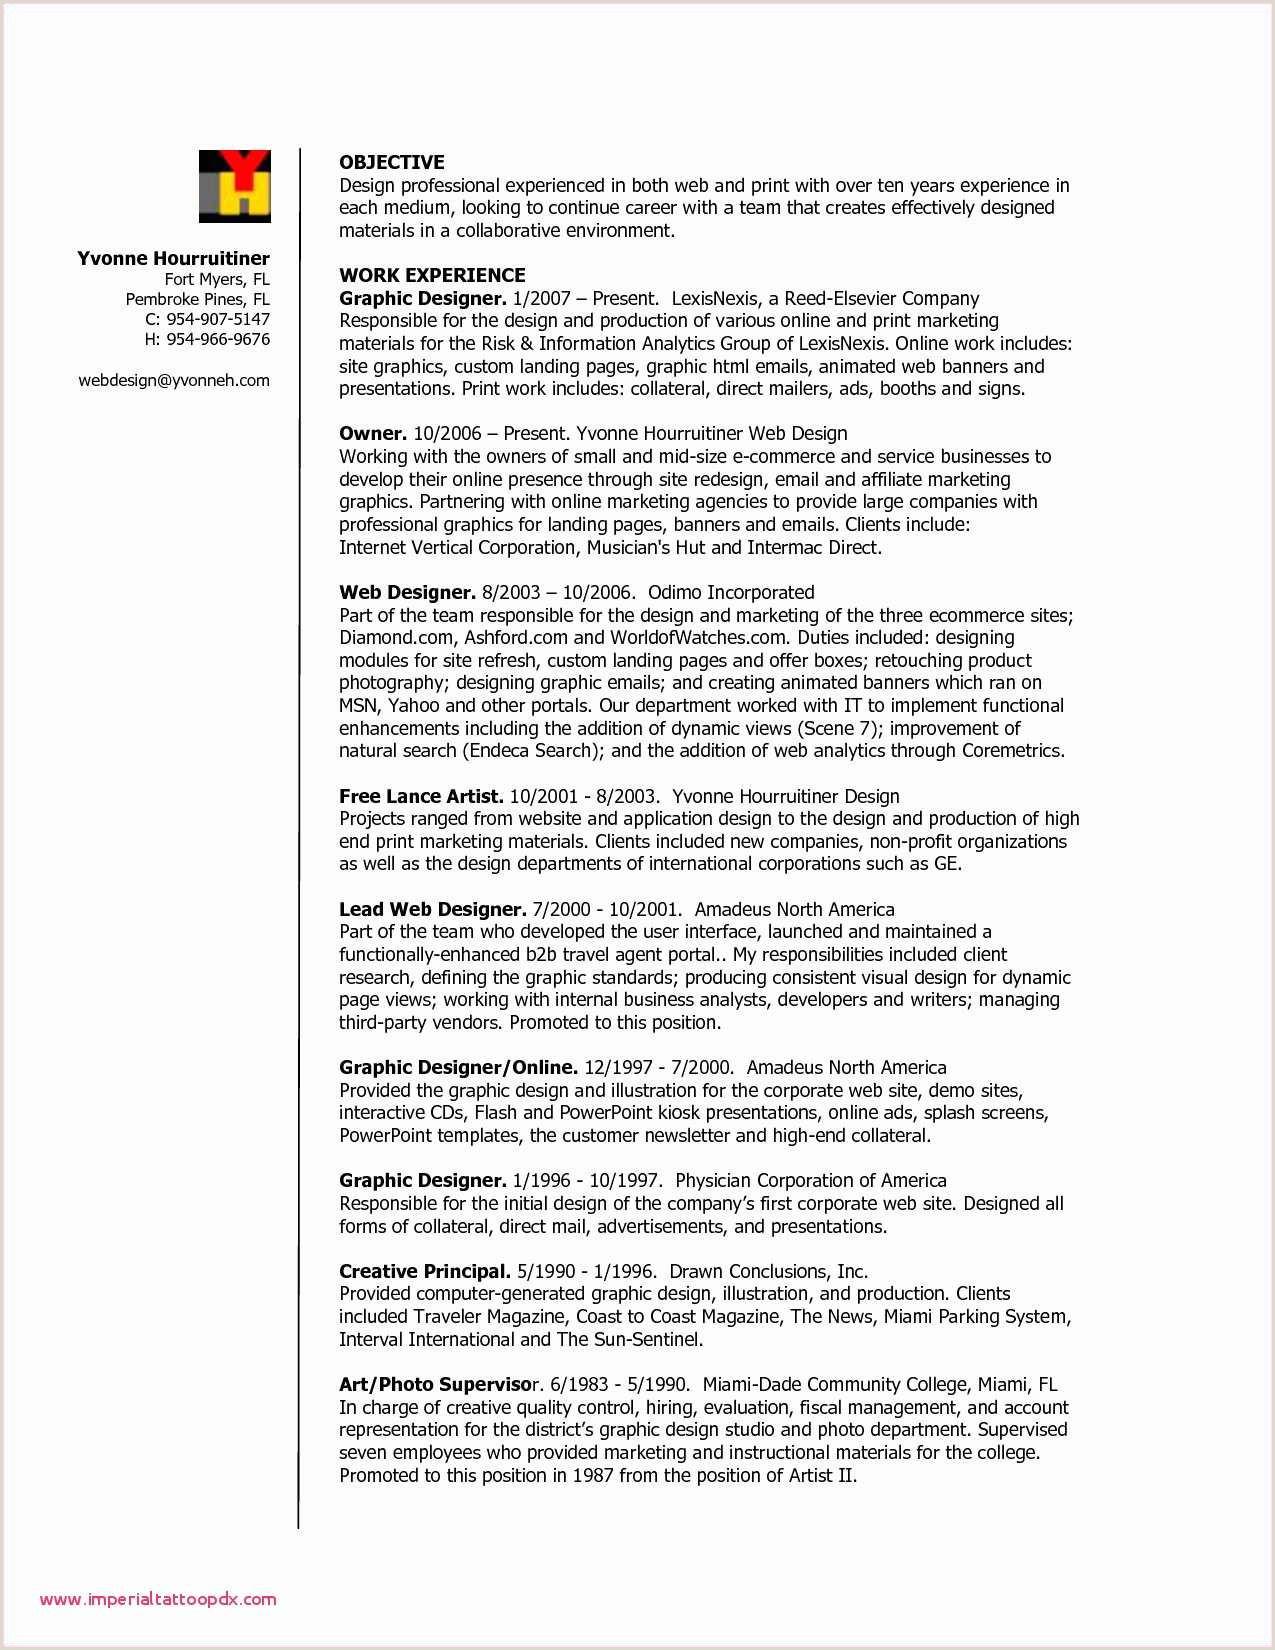 Best Resume panies Professional Resume Builders for Hire